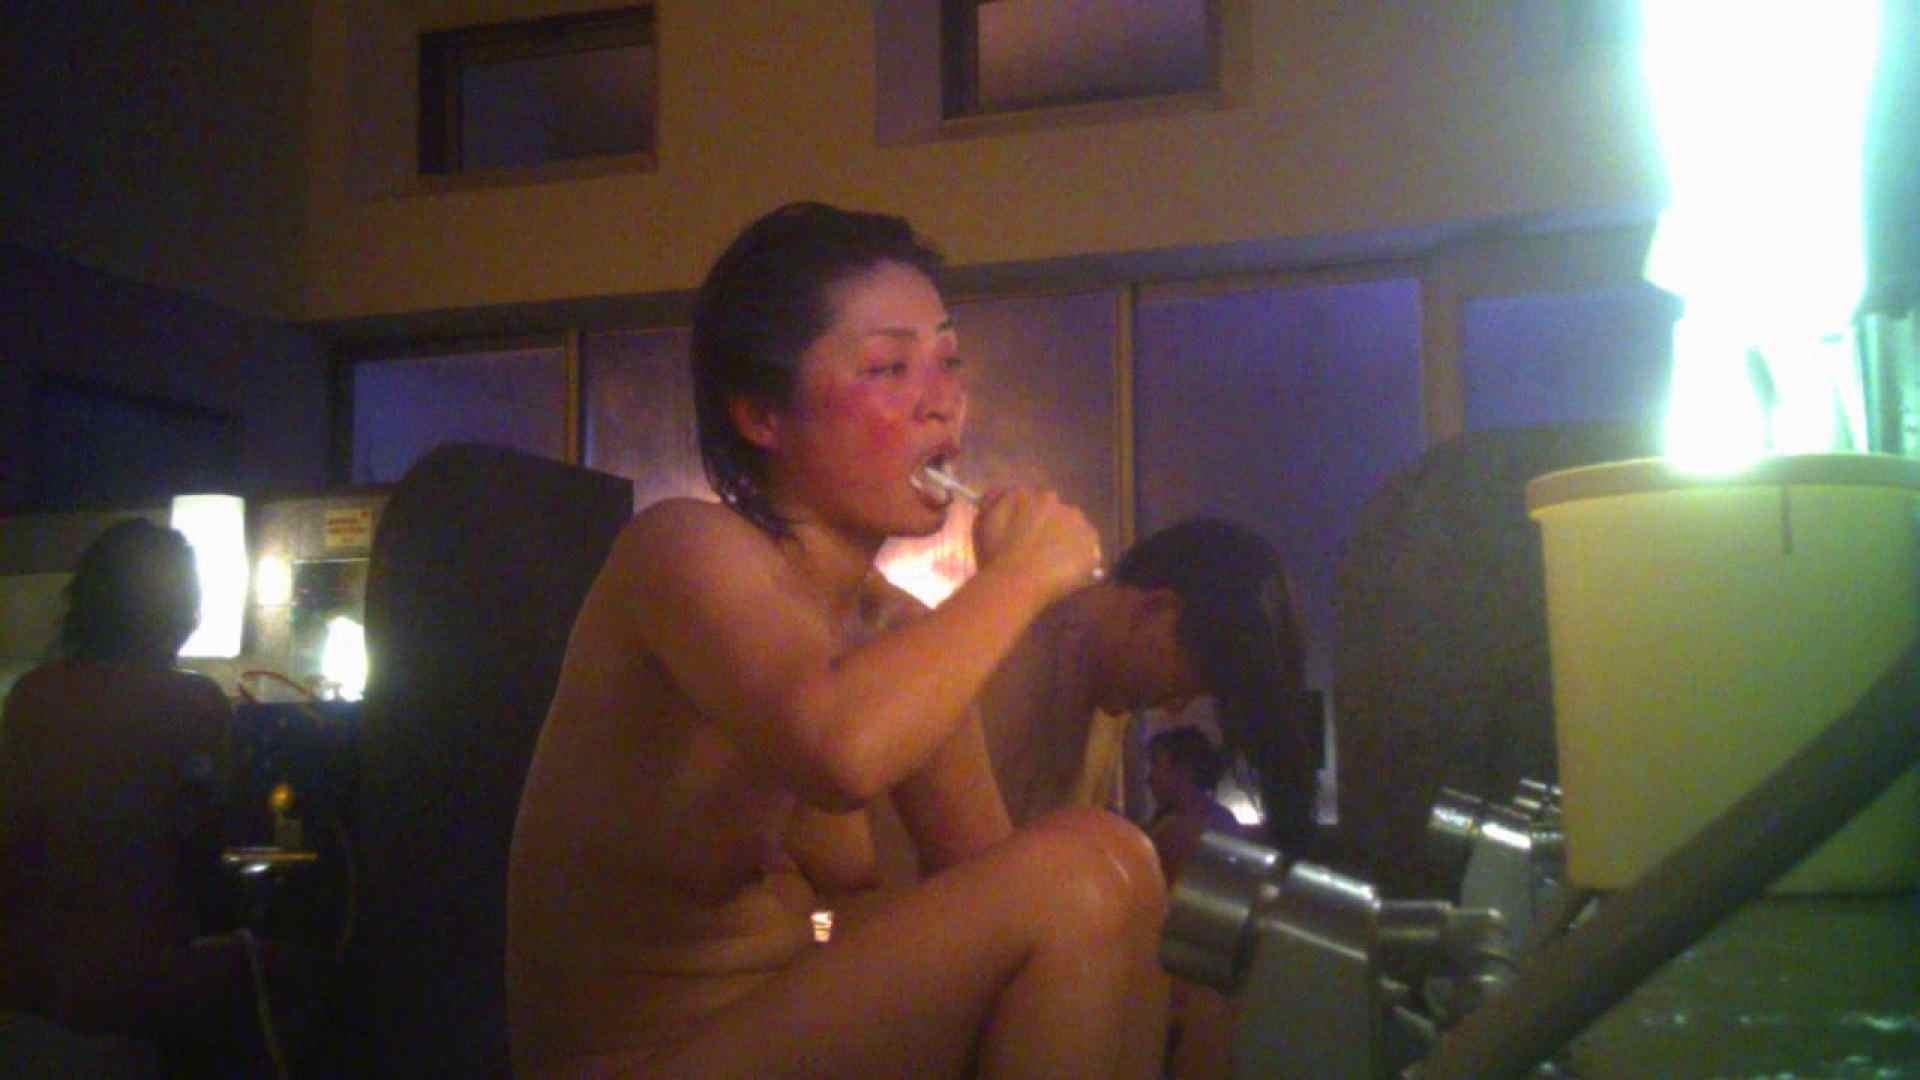 TG.21 【上等兵】井戸端会議が大好きな奥さん 潜入エロ調査   女風呂ハメ撮り  51連発 4